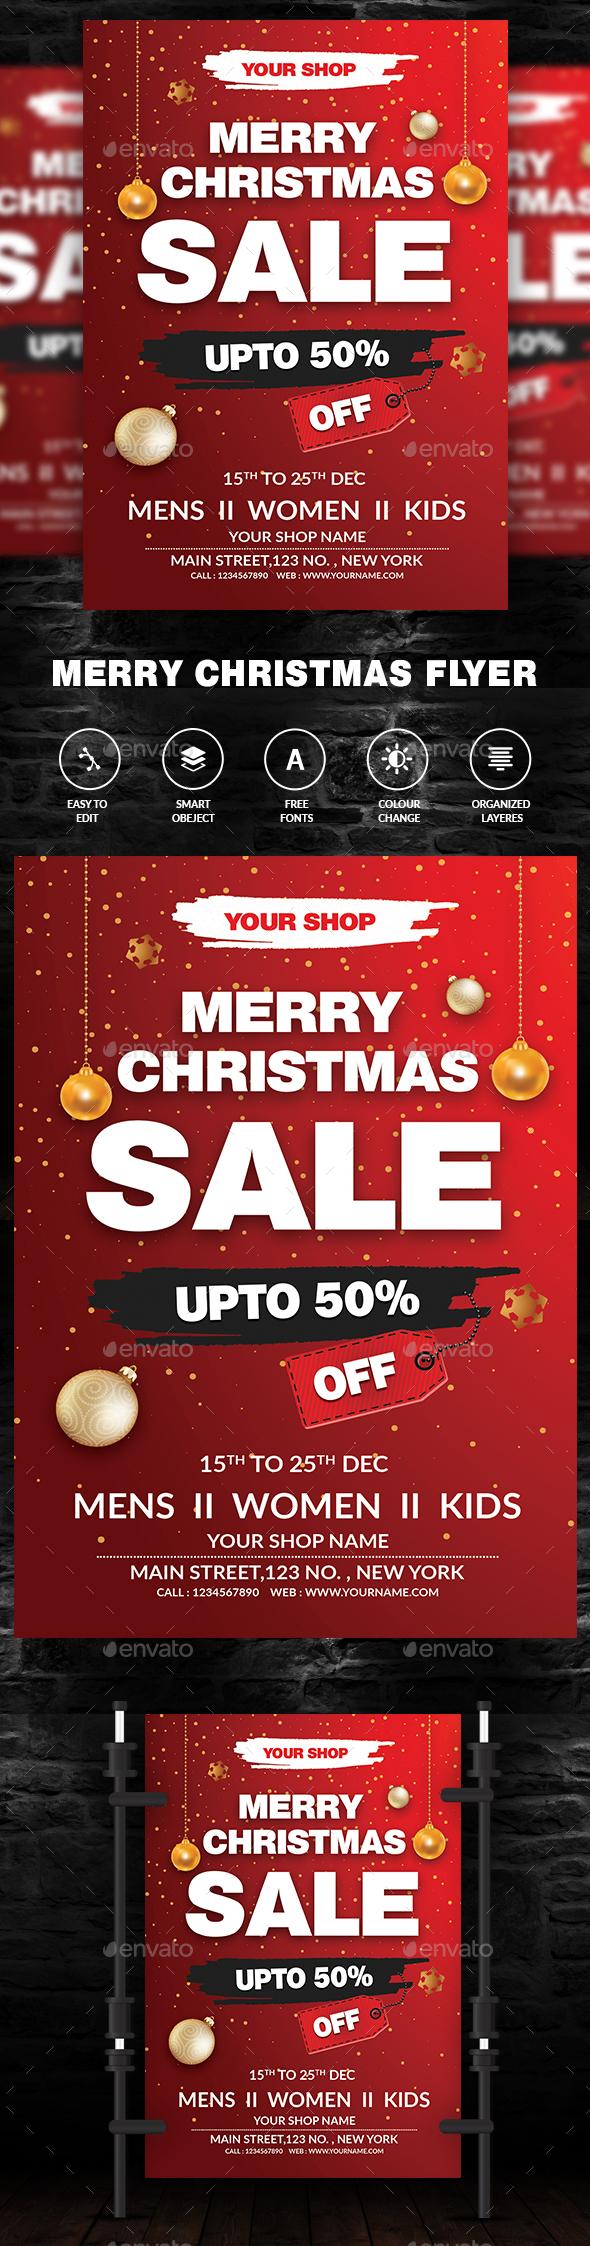 GraphicRiver Christmas Sale Flyer 21096166